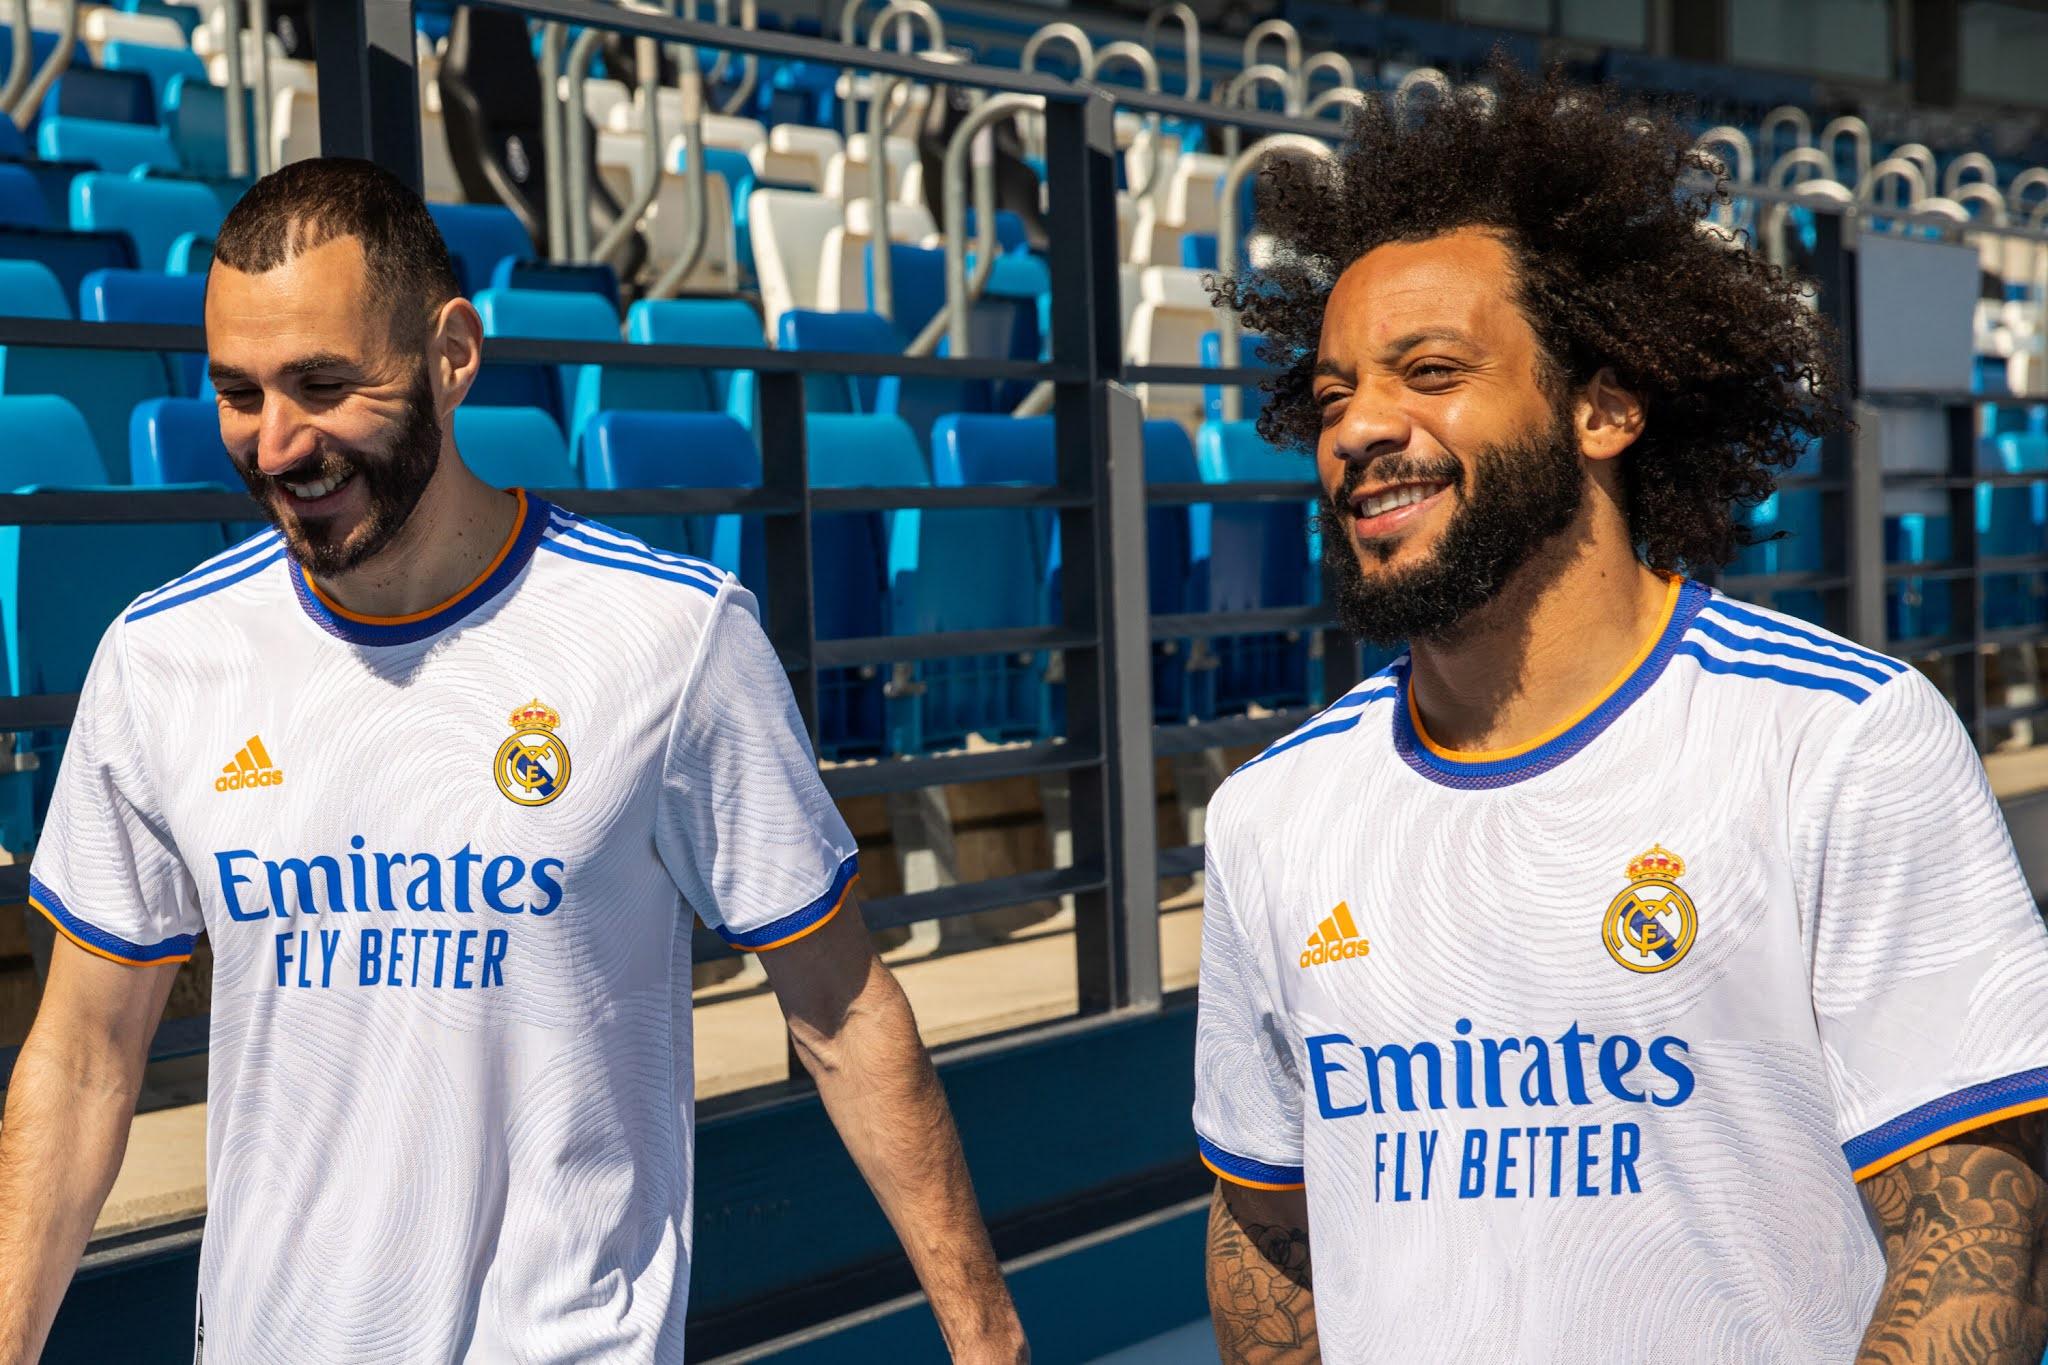 real-madrid-2021-2022-kits-and-logo-dream-league-soccer-2021-kits